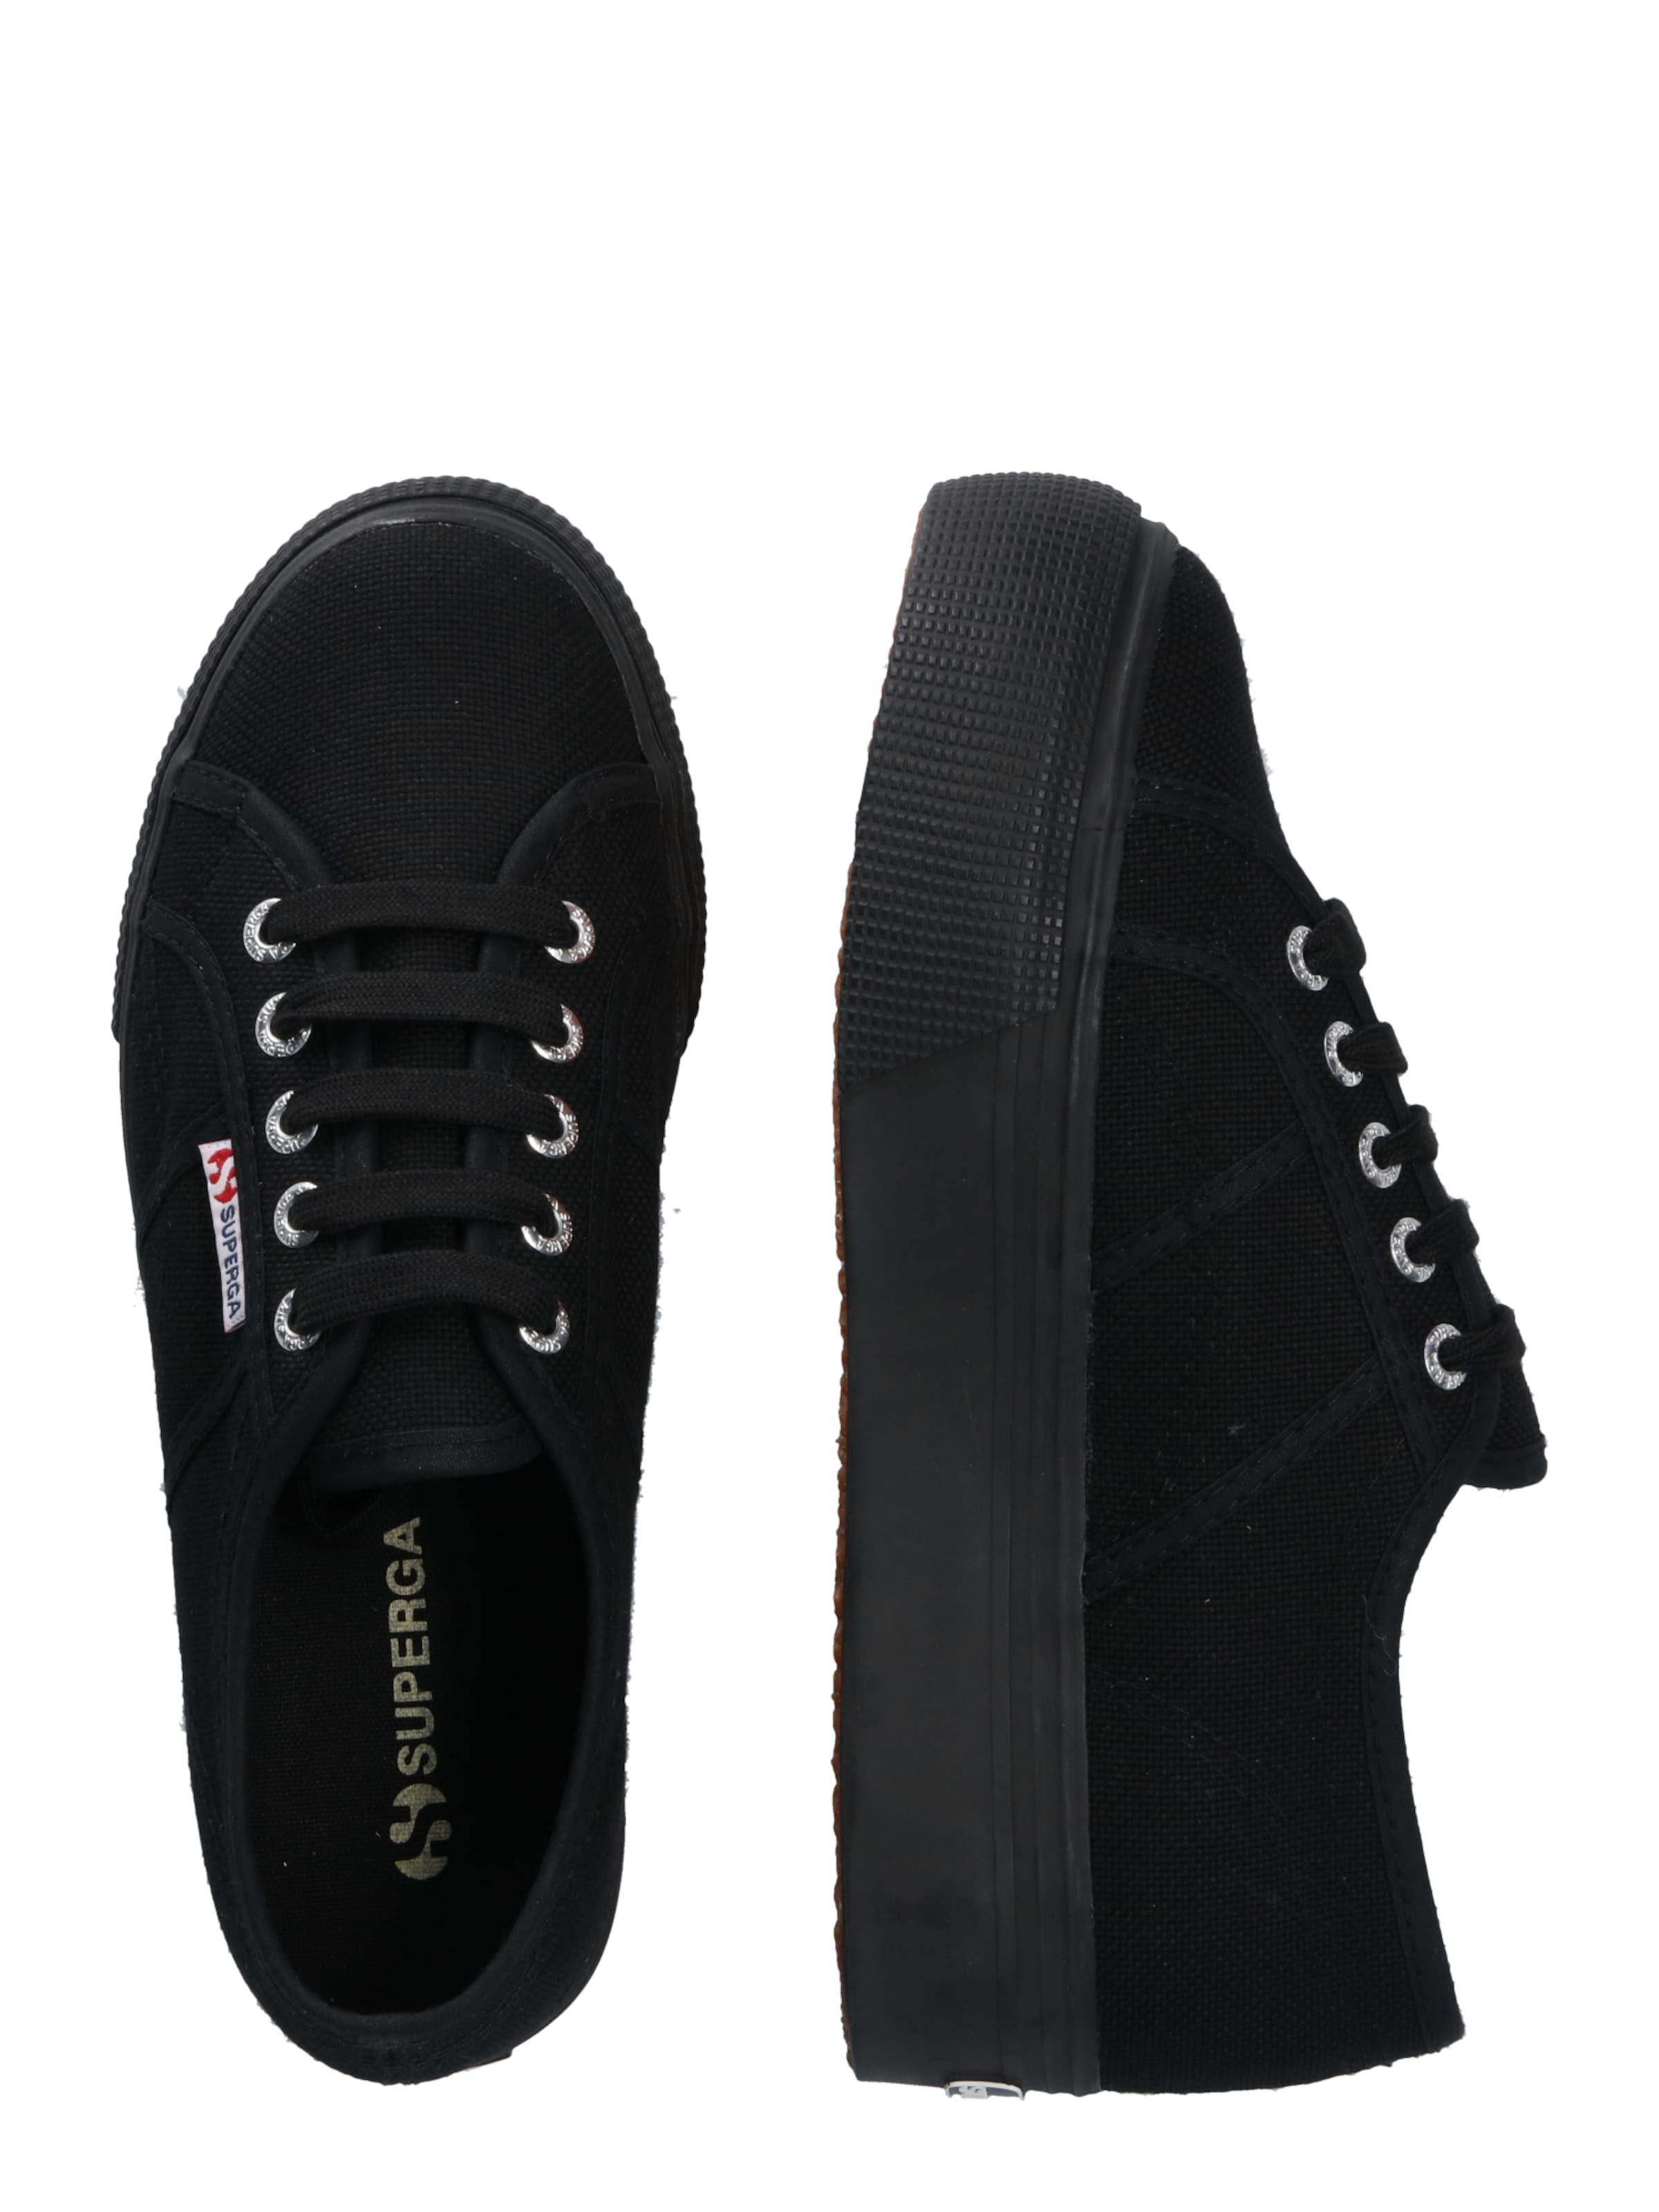 Down' Acotw Linea Superga Sneaker Schwarz '2790 In Upamp; SMpzVU